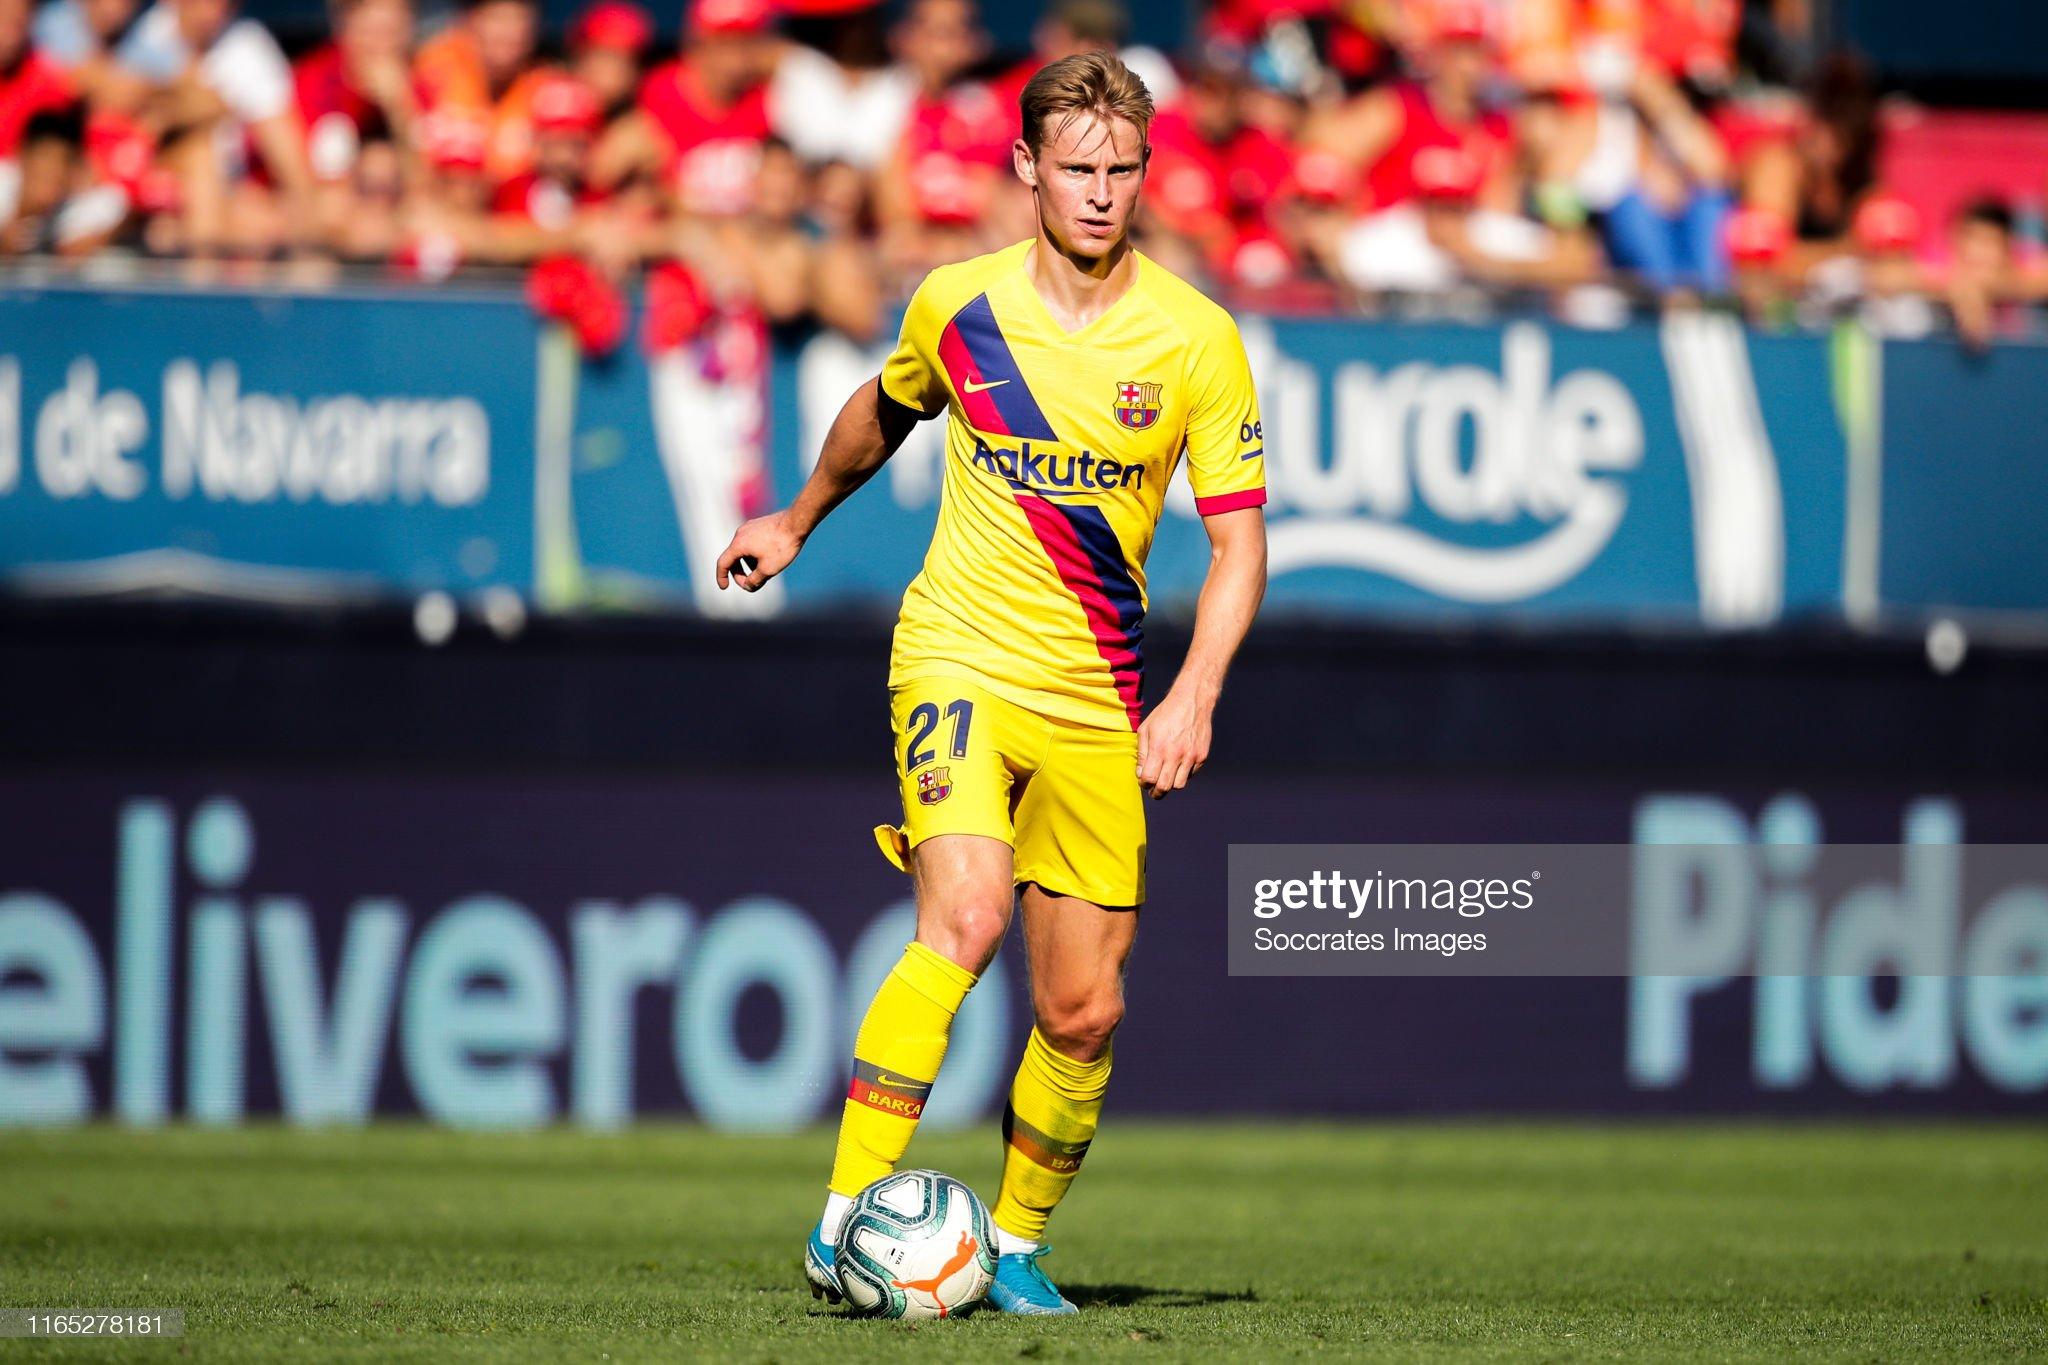 صور مباراة : أوساسونا - برشلونة 2-2 ( 31-08-2019 )  Frenkie-de-jong-of-fc-barcelona-during-the-la-liga-santander-match-picture-id1165278181?s=2048x2048